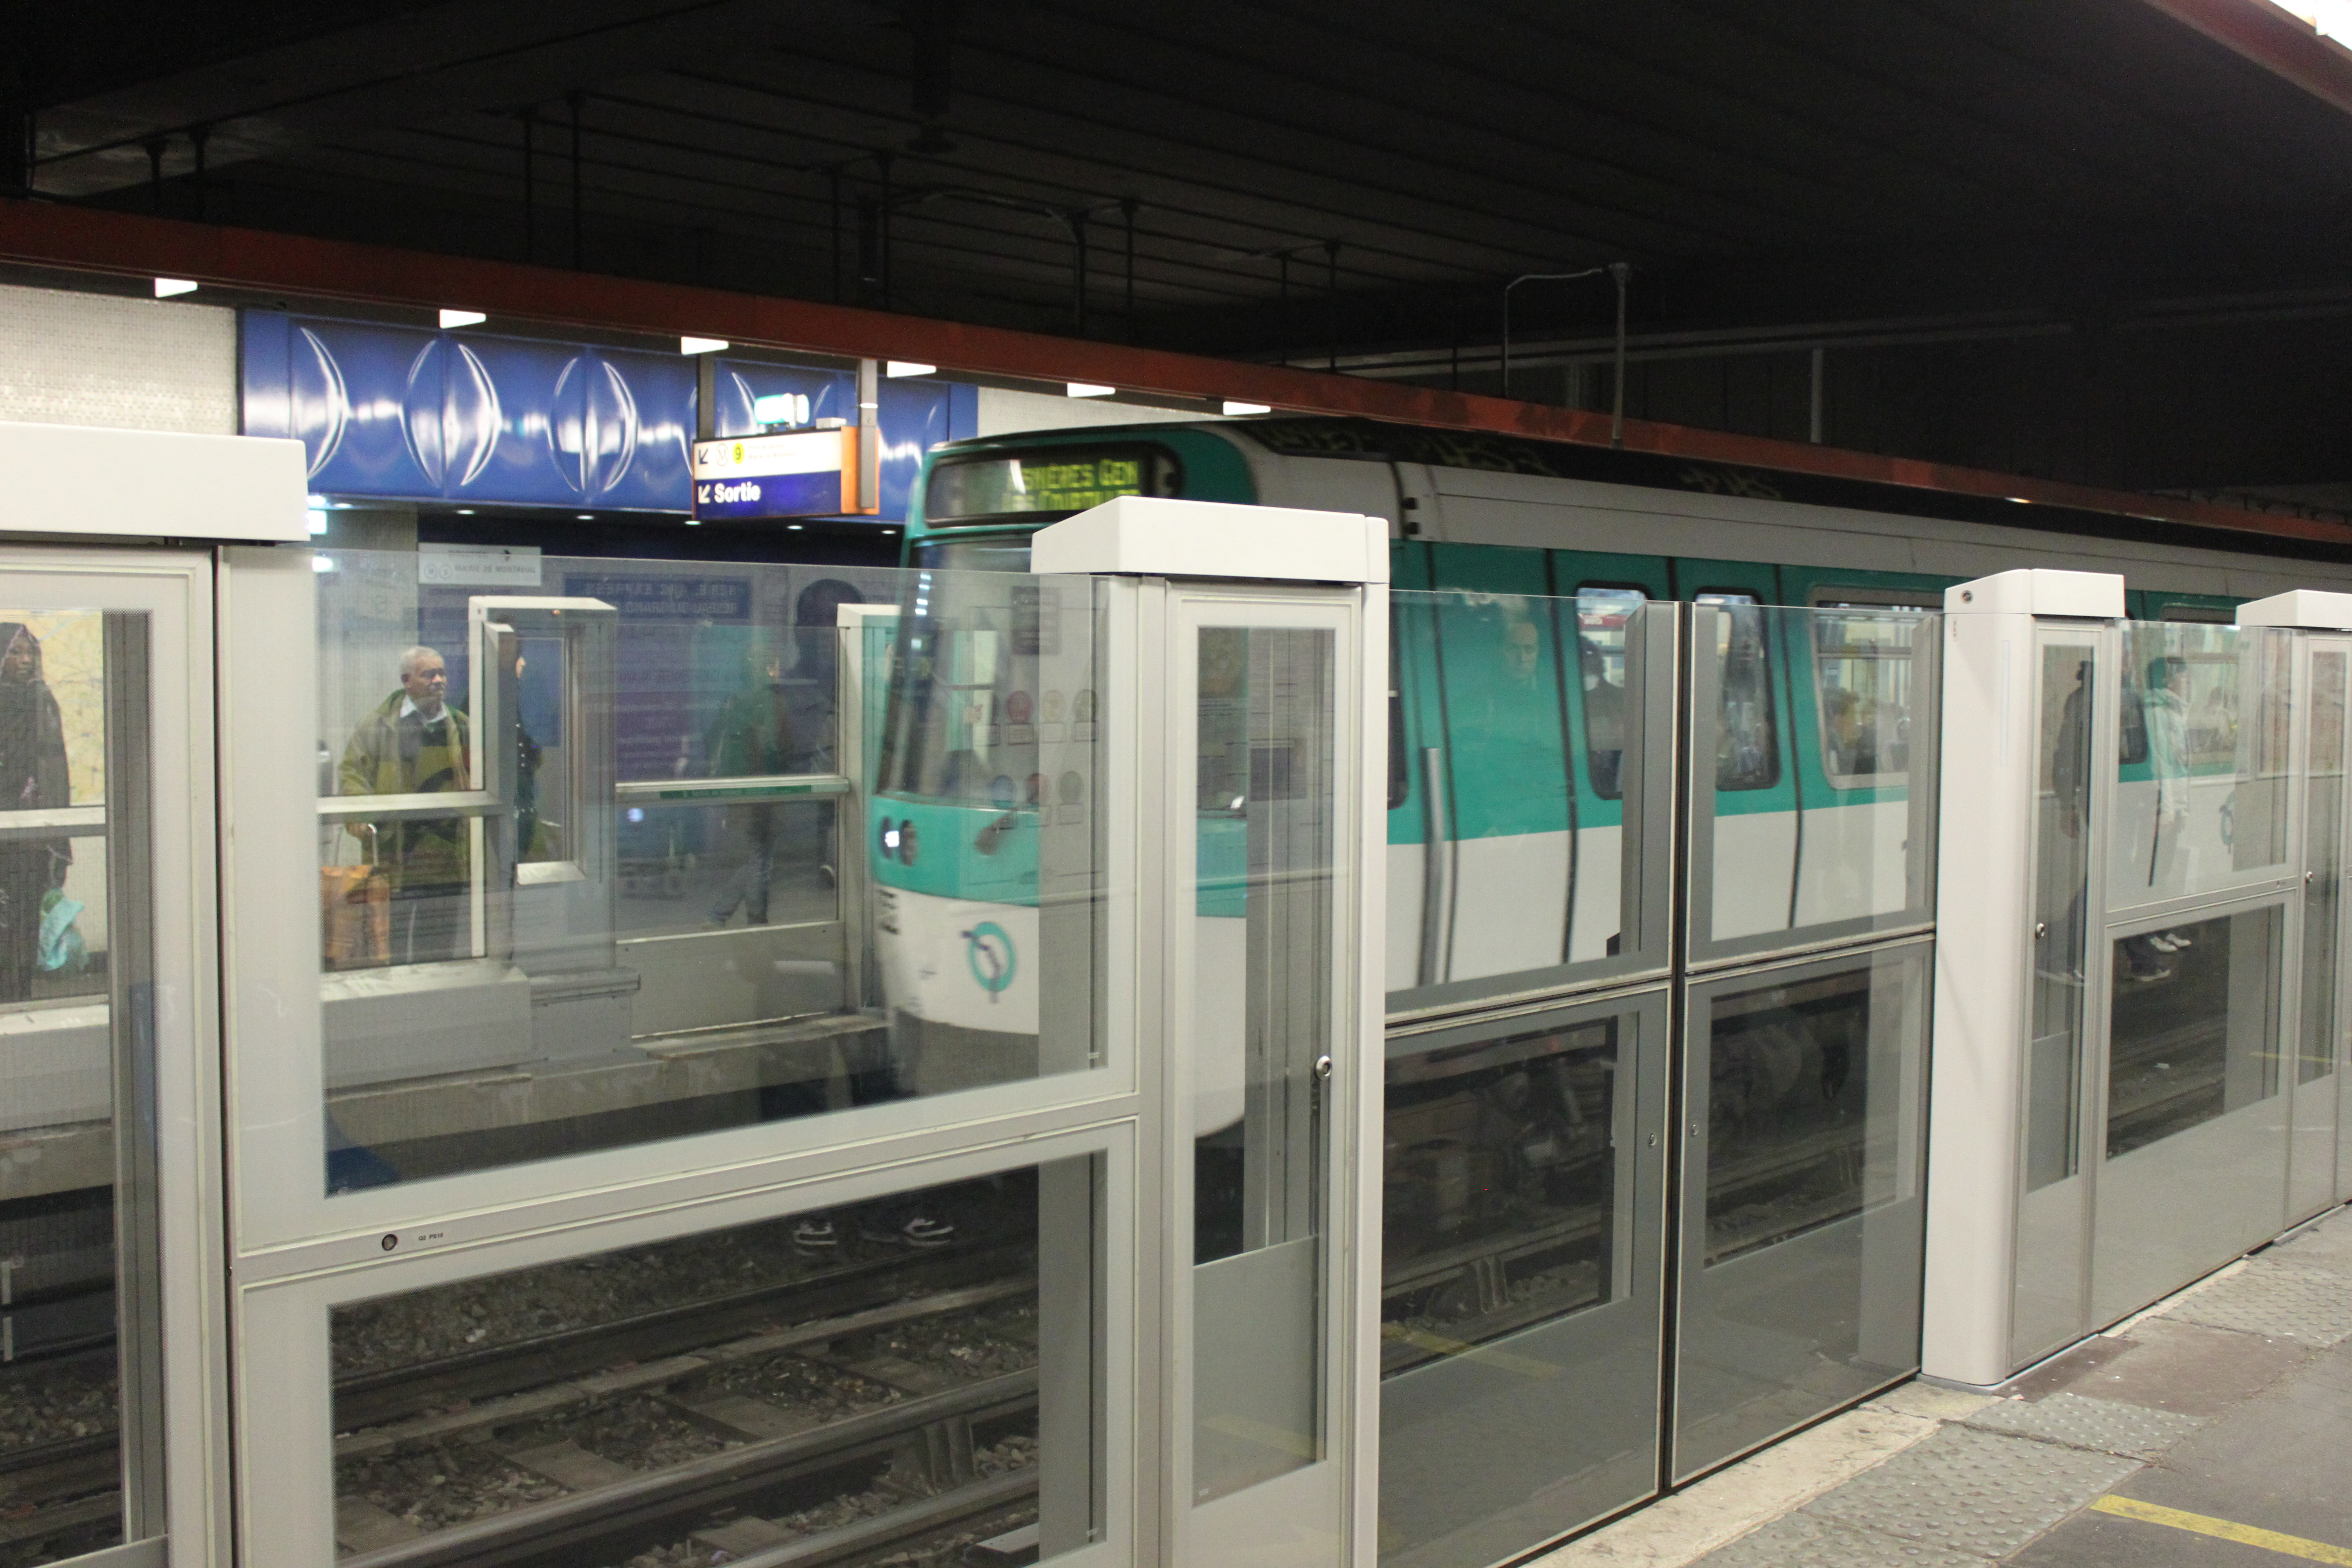 FileMetro de Paris - Line 13 - Miromesnil - Platform screen doors (4 & File:Metro de Paris - Line 13 - Miromesnil - Platform screen doors ...